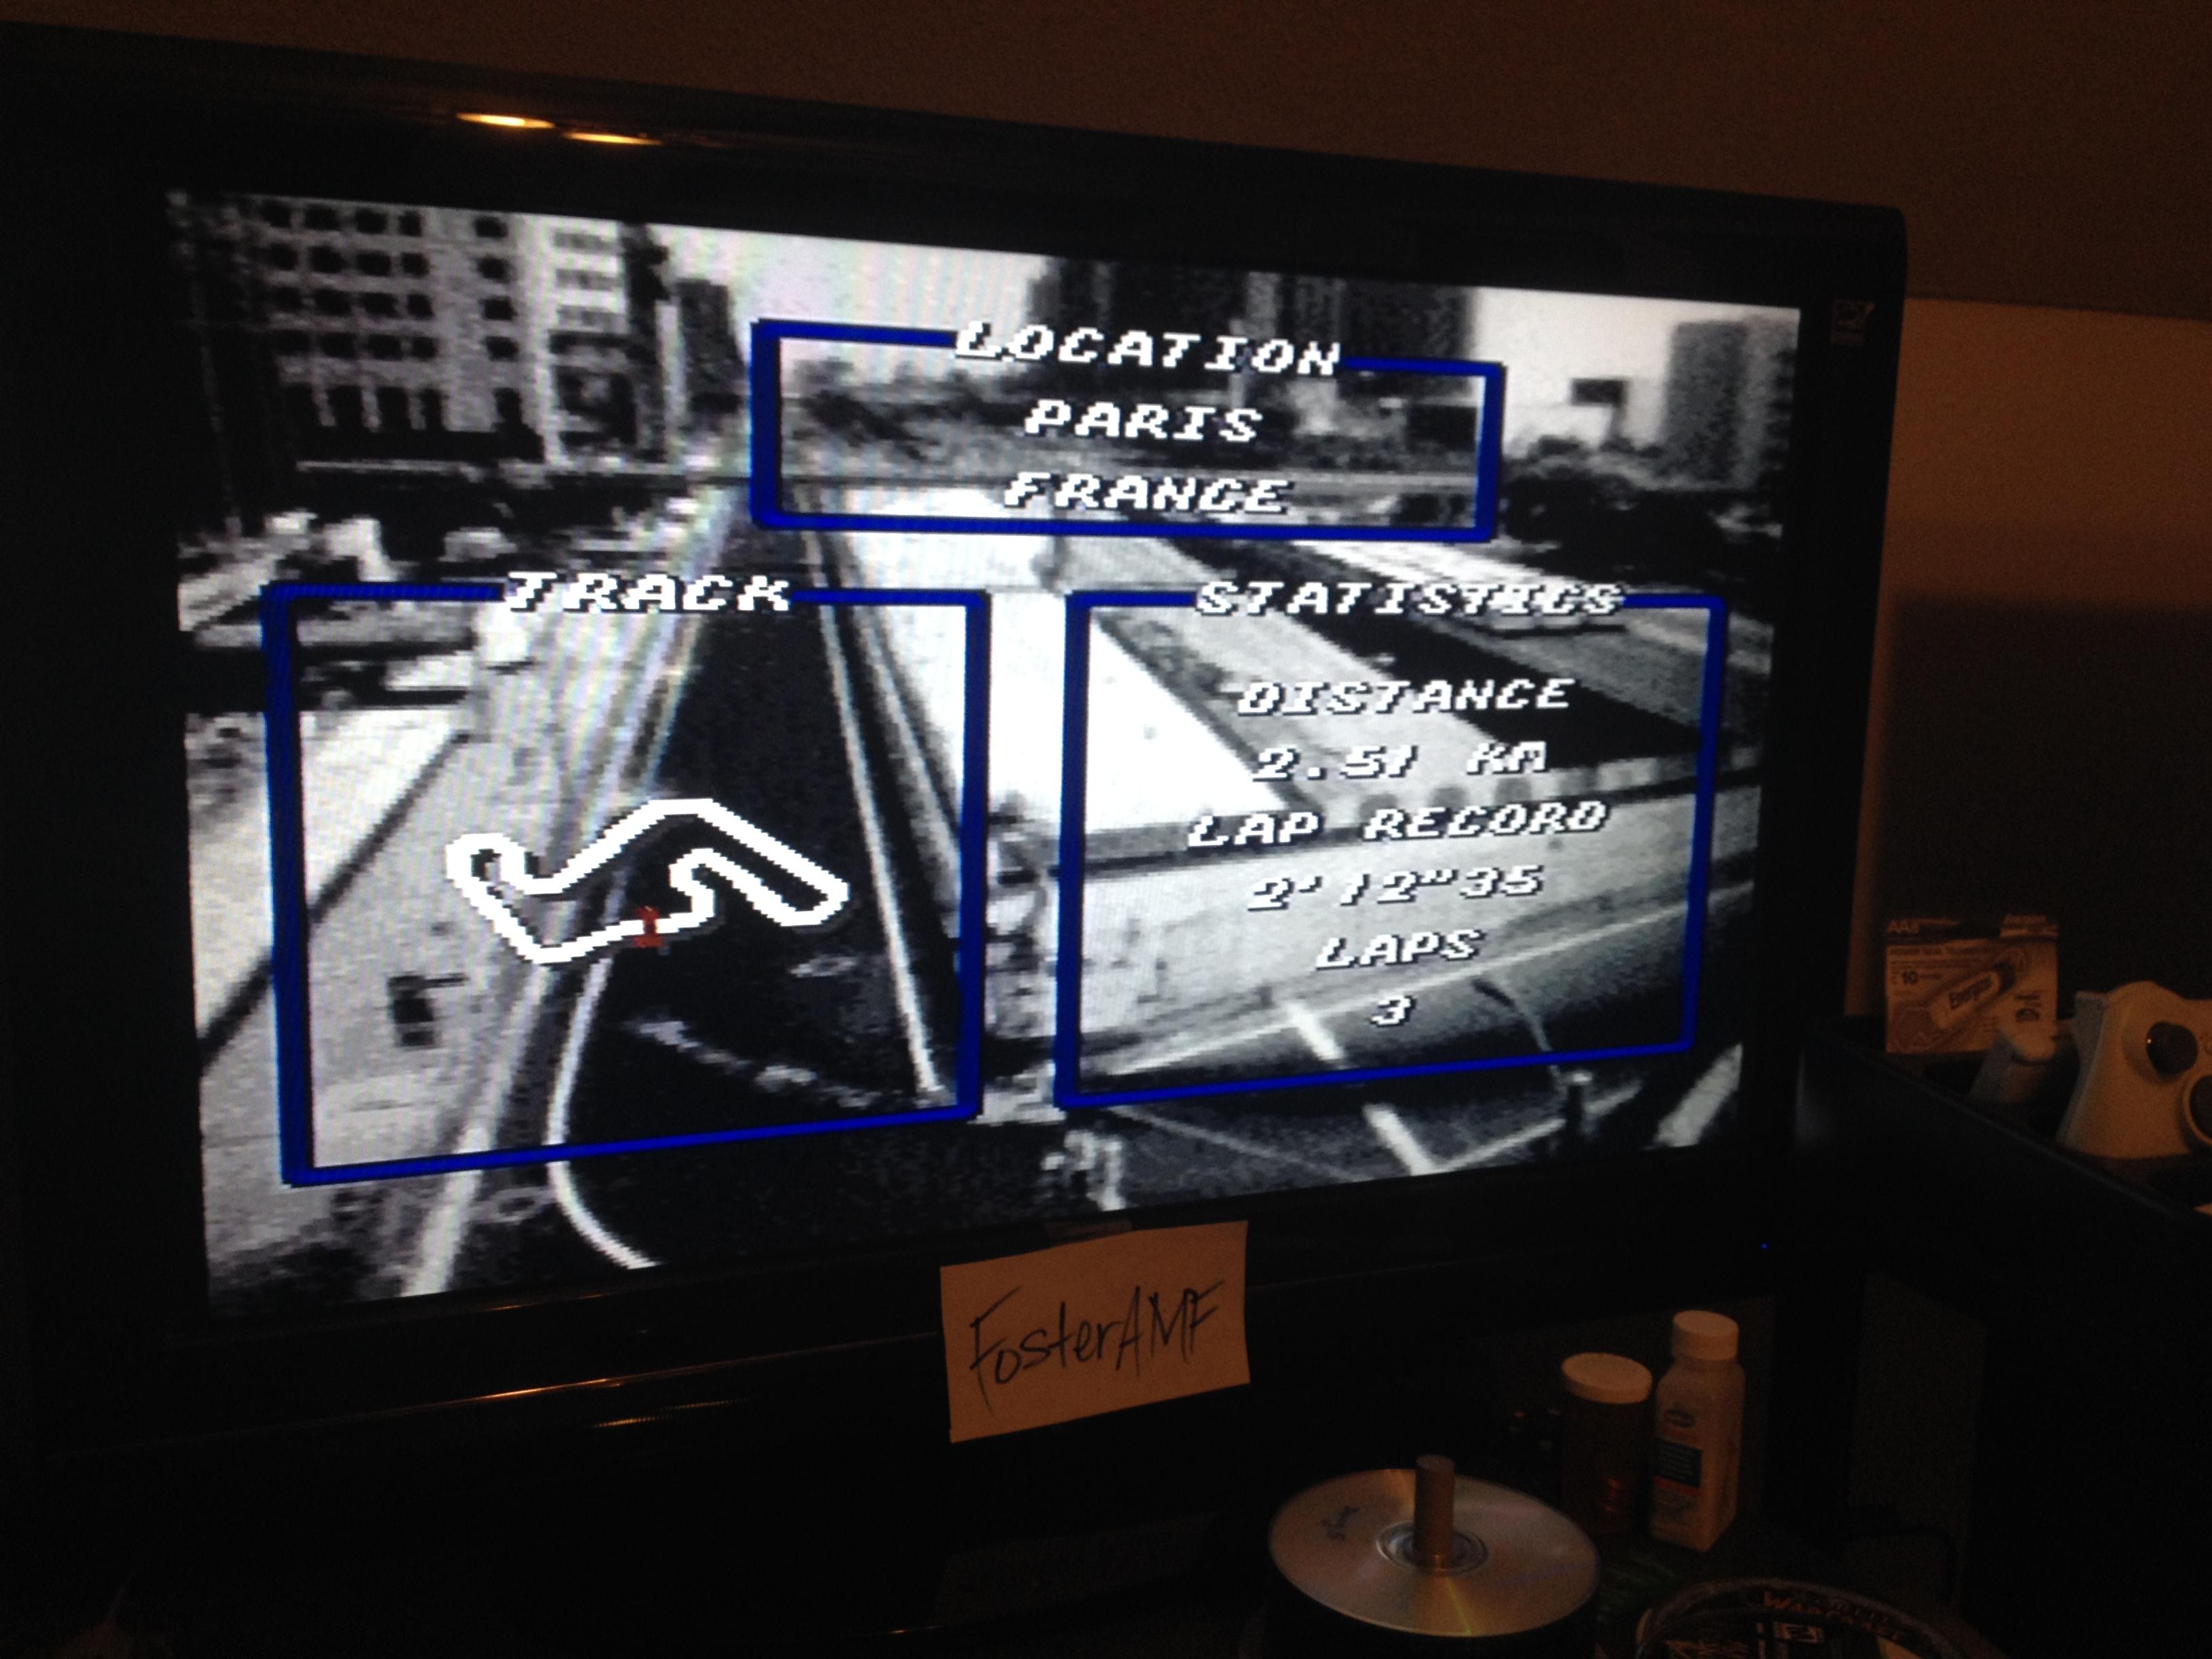 FosterAMF: Top Gear [Track 21: Paris/Amateur Difficulty/No Nitro] (SNES/Super Famicom) 0:02:14.6 points on 2014-07-31 02:56:07